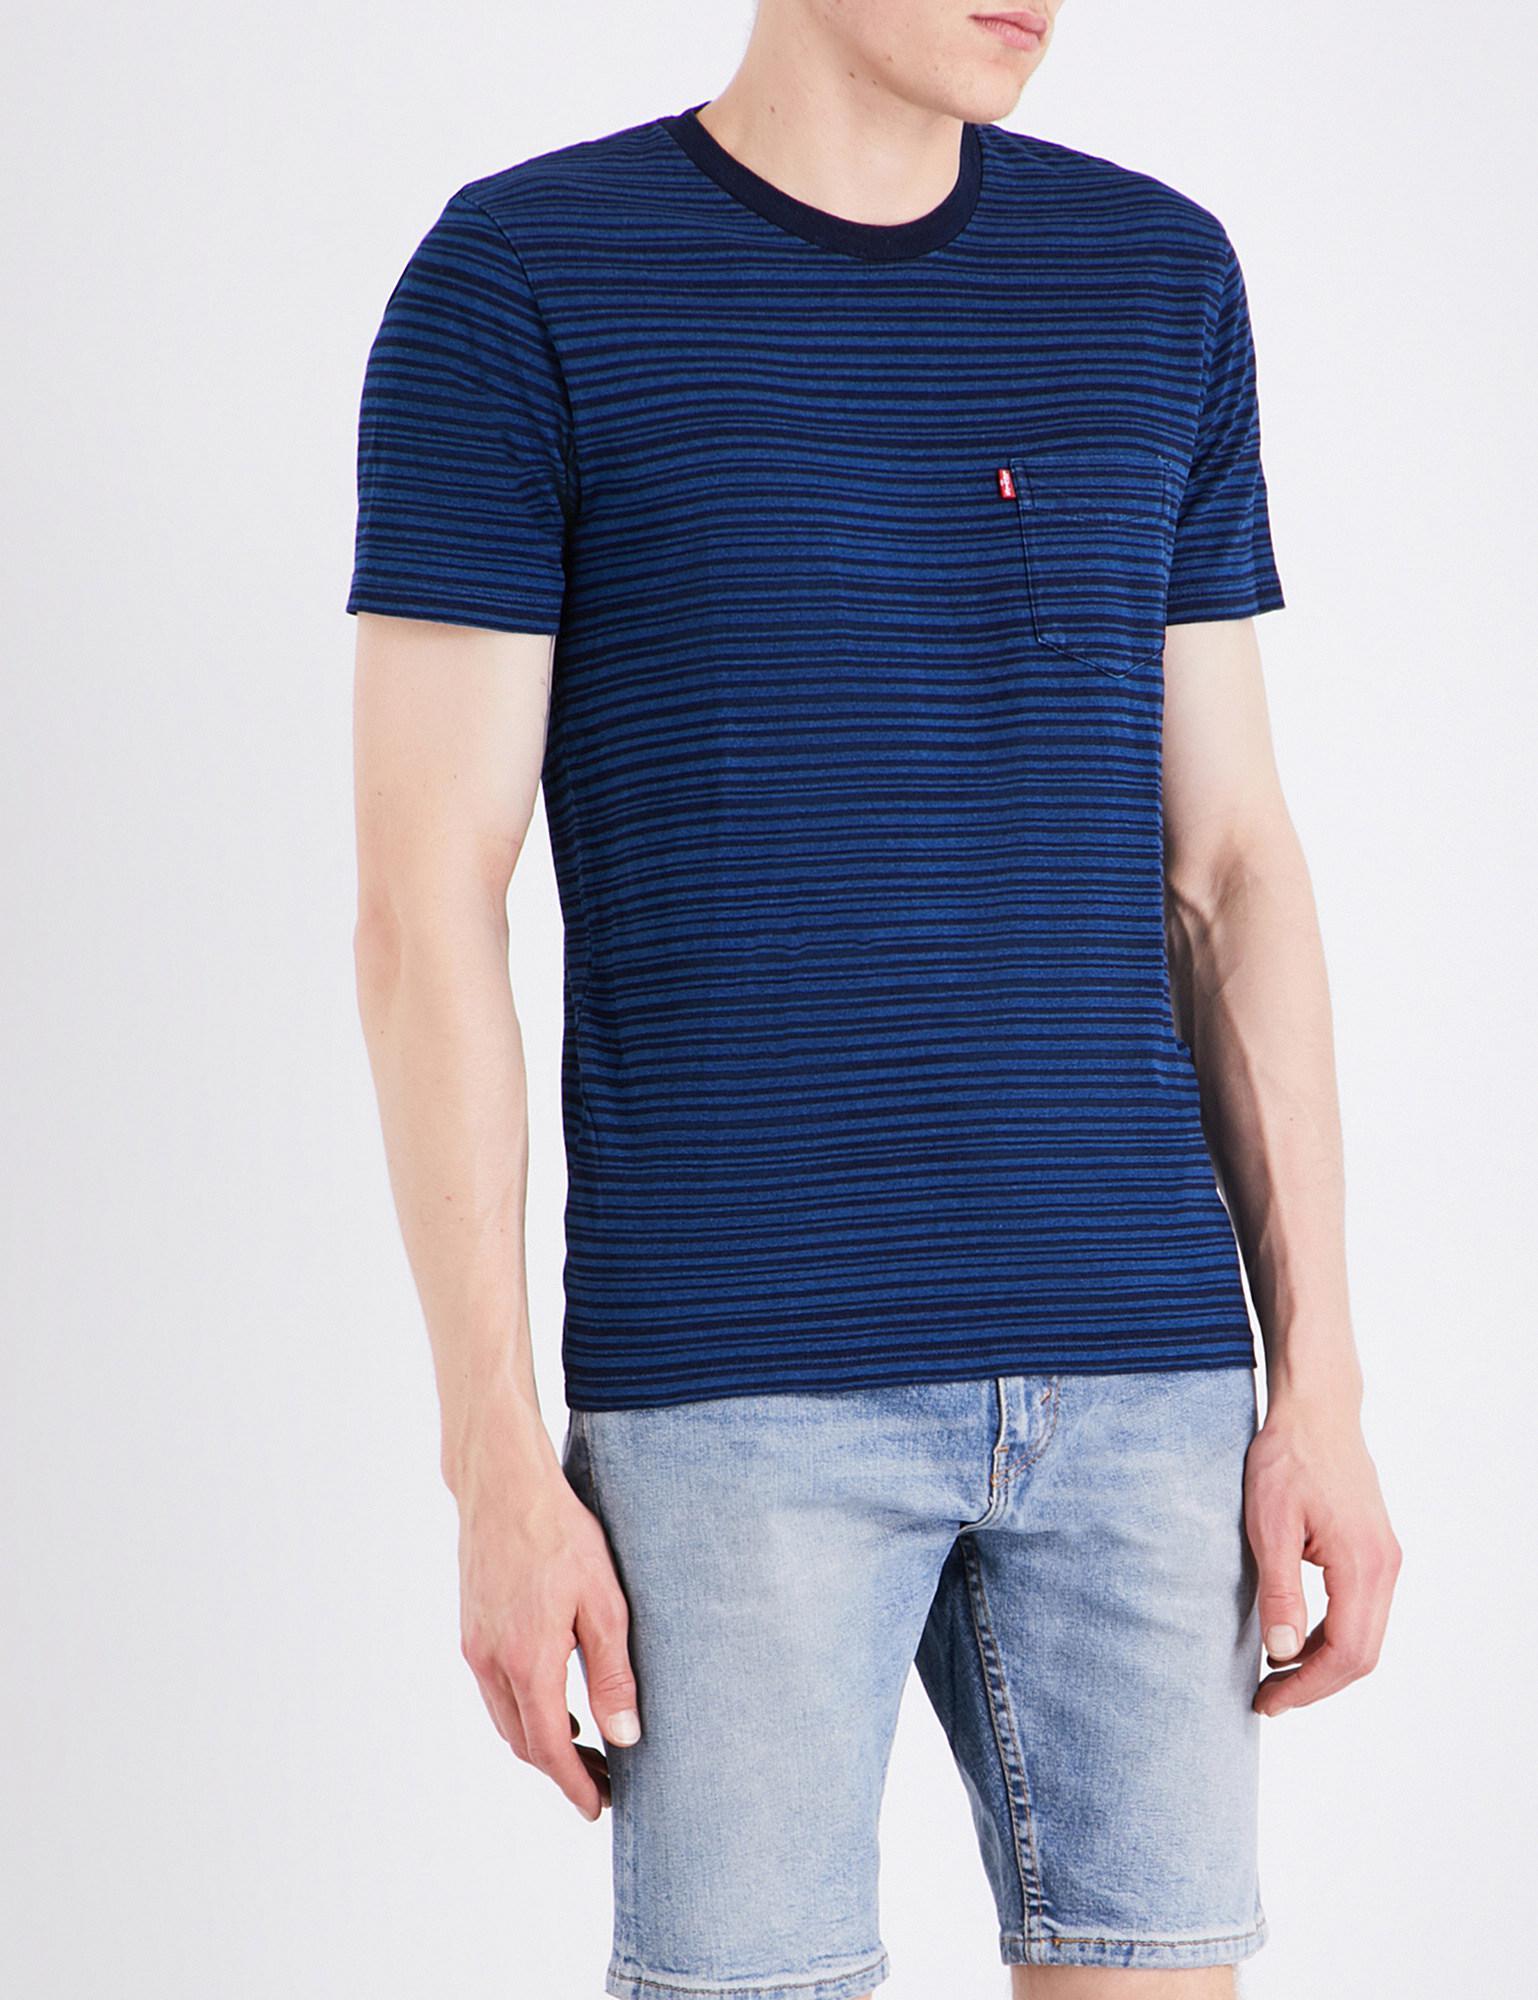 Levi's. Men's Blue Sunset Striped Cotton-jersey T-shirt